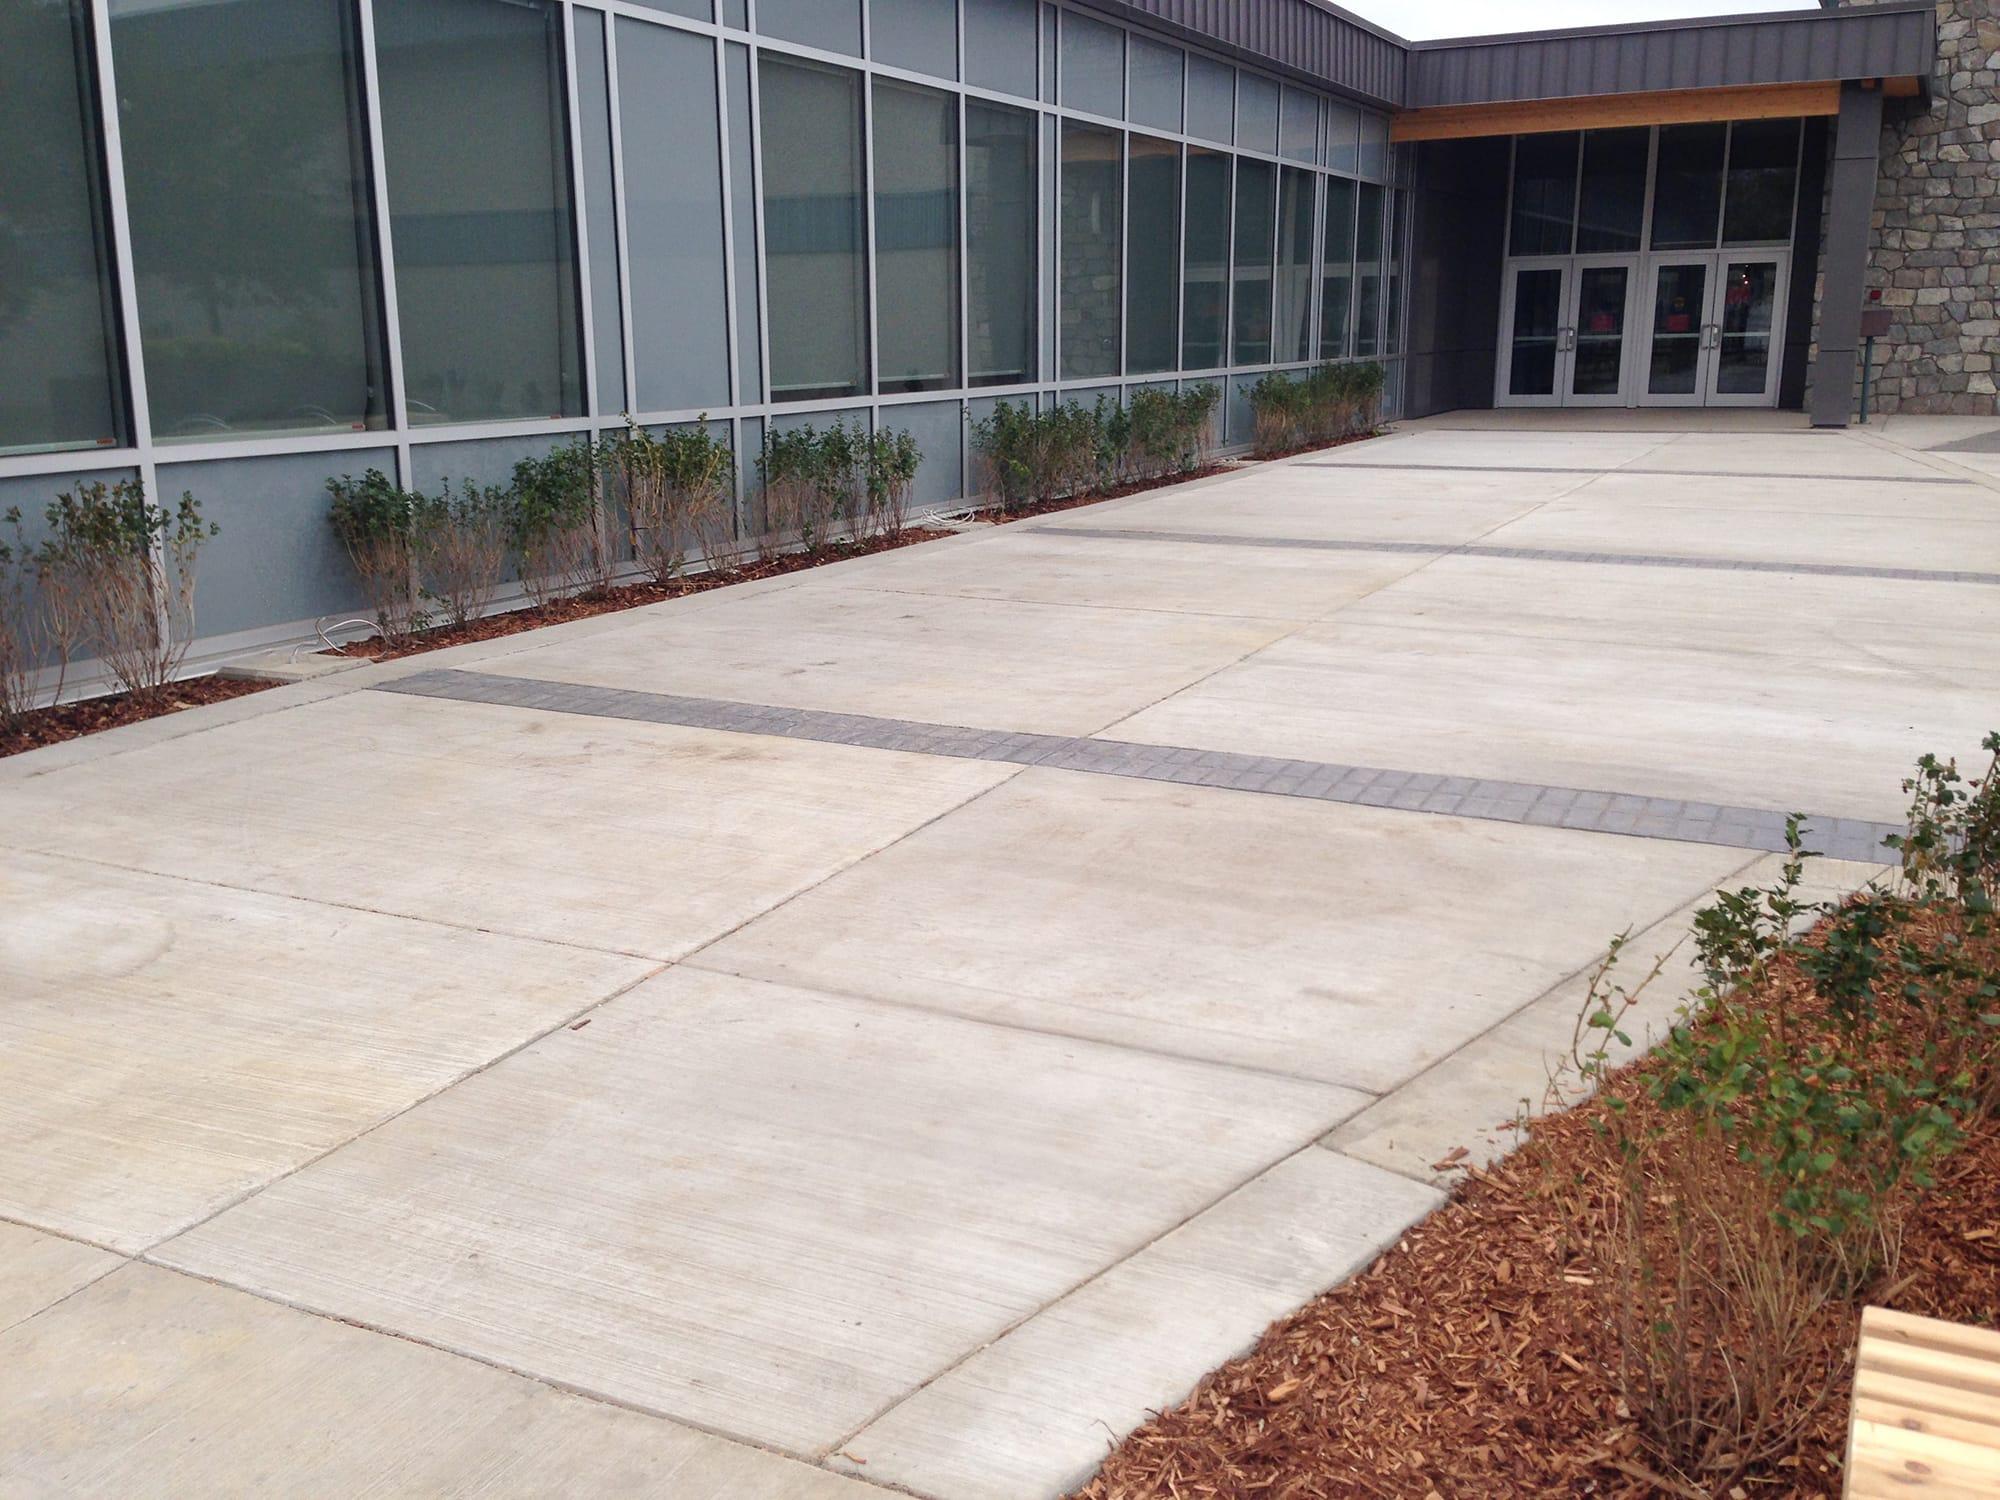 Glenmary School exterior paving